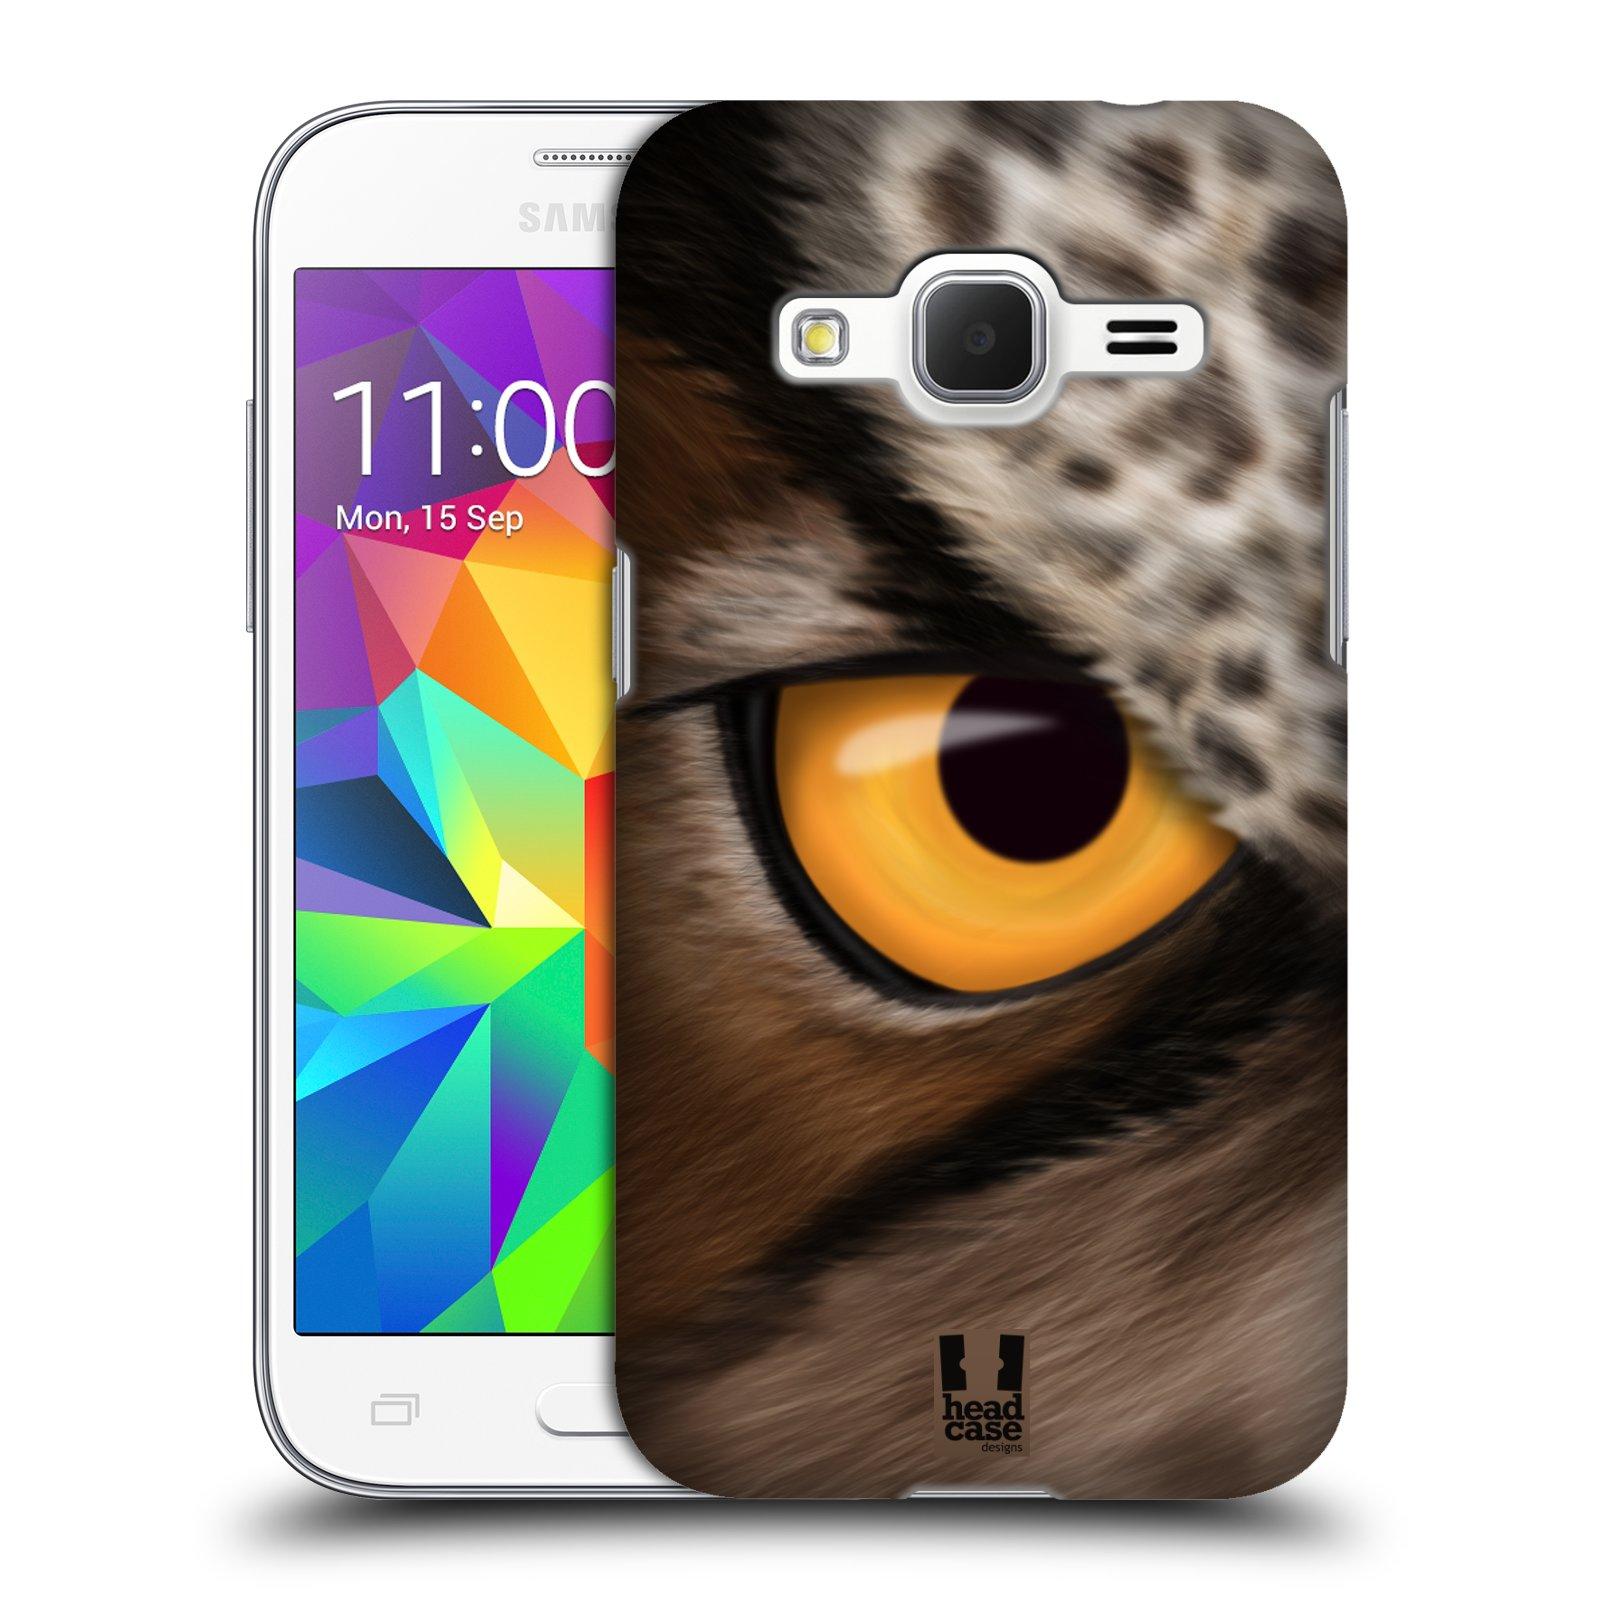 HEAD CASE plastový obal na mobil SAMSUNG GALAXY Core Prime (Core Prime VE) vzor pohled zvířete oko sova